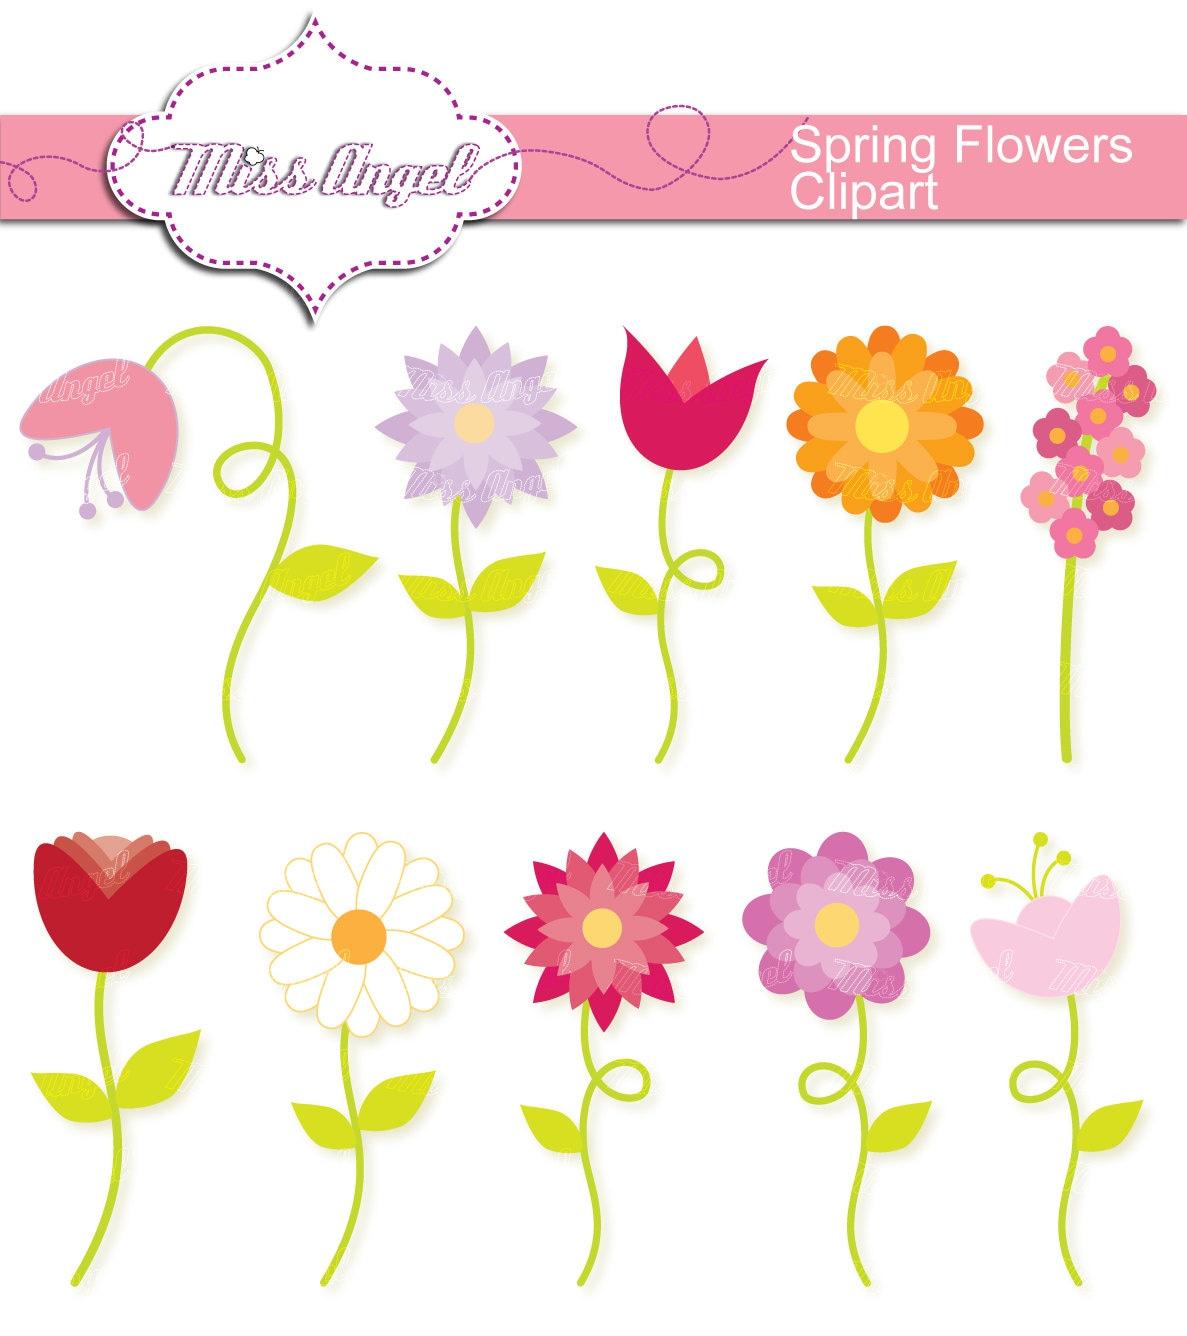 Spring Flowers CLIPART SET 10 Digital Flowers. 6 clip